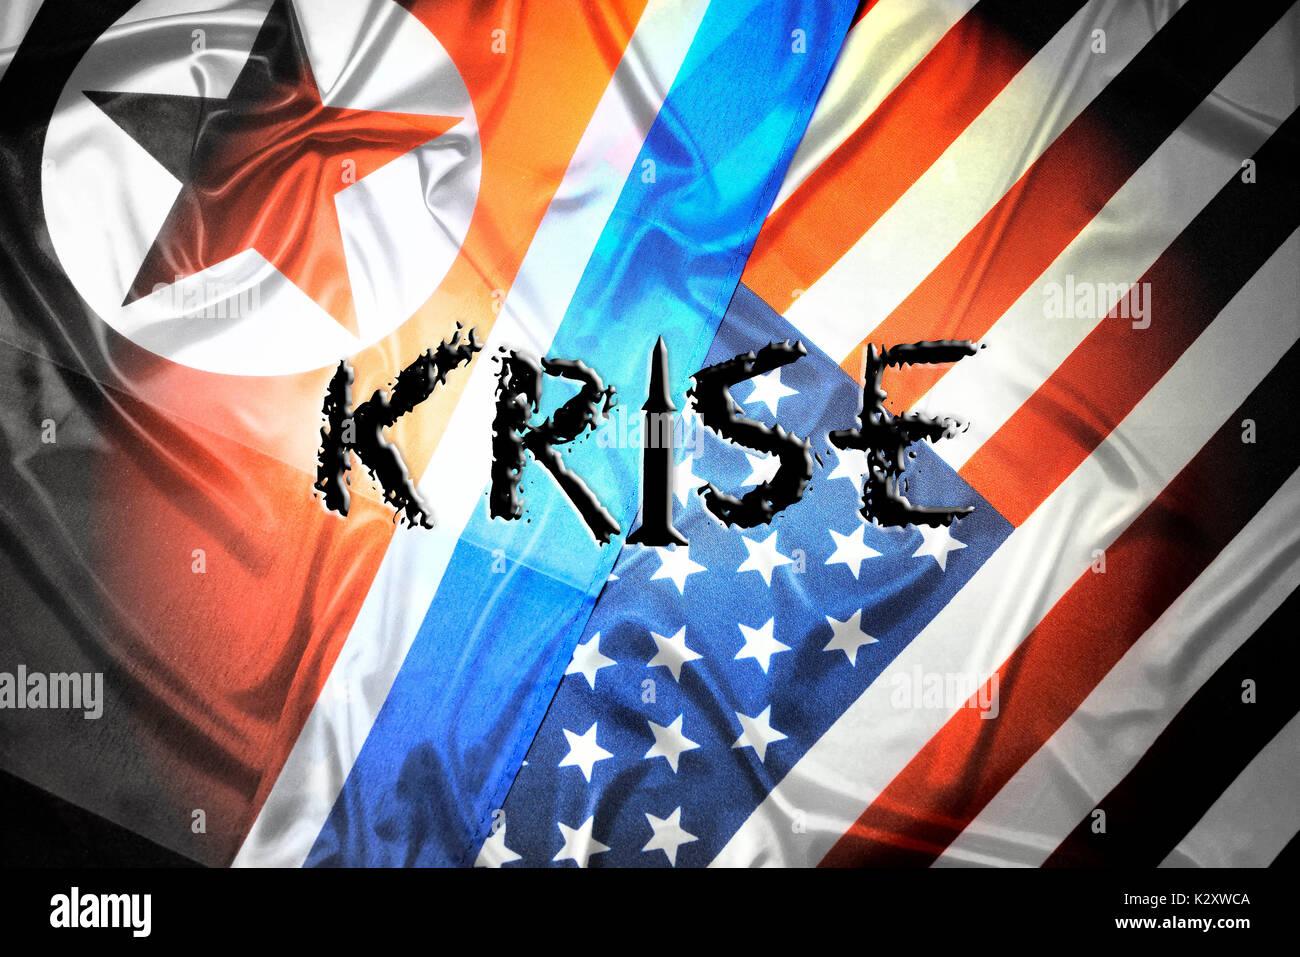 Flags of the USA and North Korea with the stroke crisis, Fahnen von den USA und Nordkorea mit dem Schriftzug Krise - Stock Image